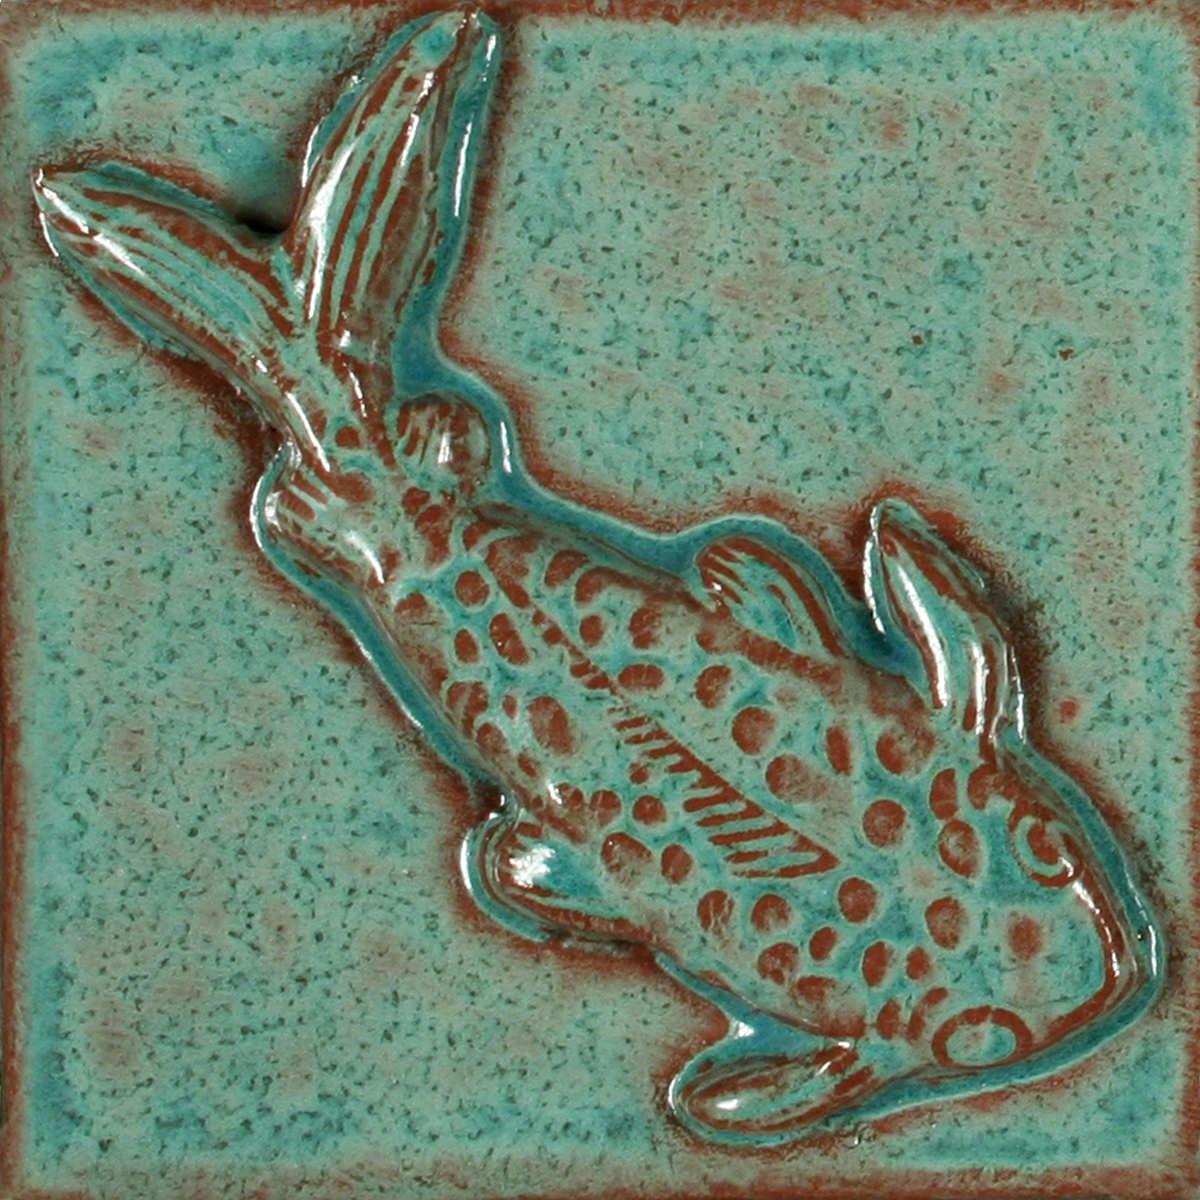 venta de esmalte para cerámica amaco textured alligator Lt-22 tahitian blue baja temperatura